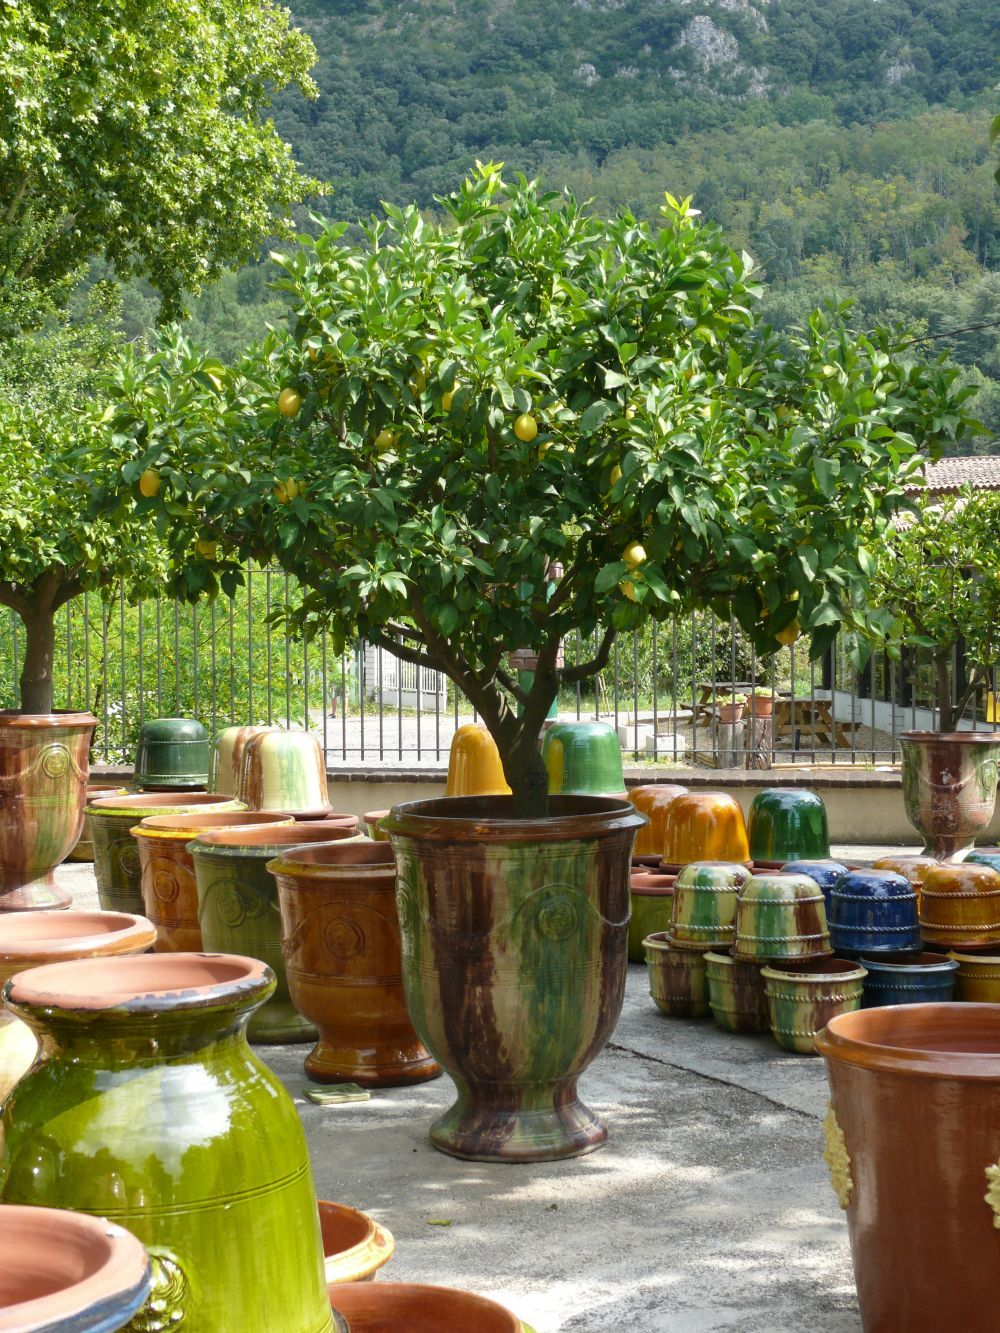 pots d 39 anduze fabrication artisanale fran aise pot d 39 anduze inspiration pinterest. Black Bedroom Furniture Sets. Home Design Ideas